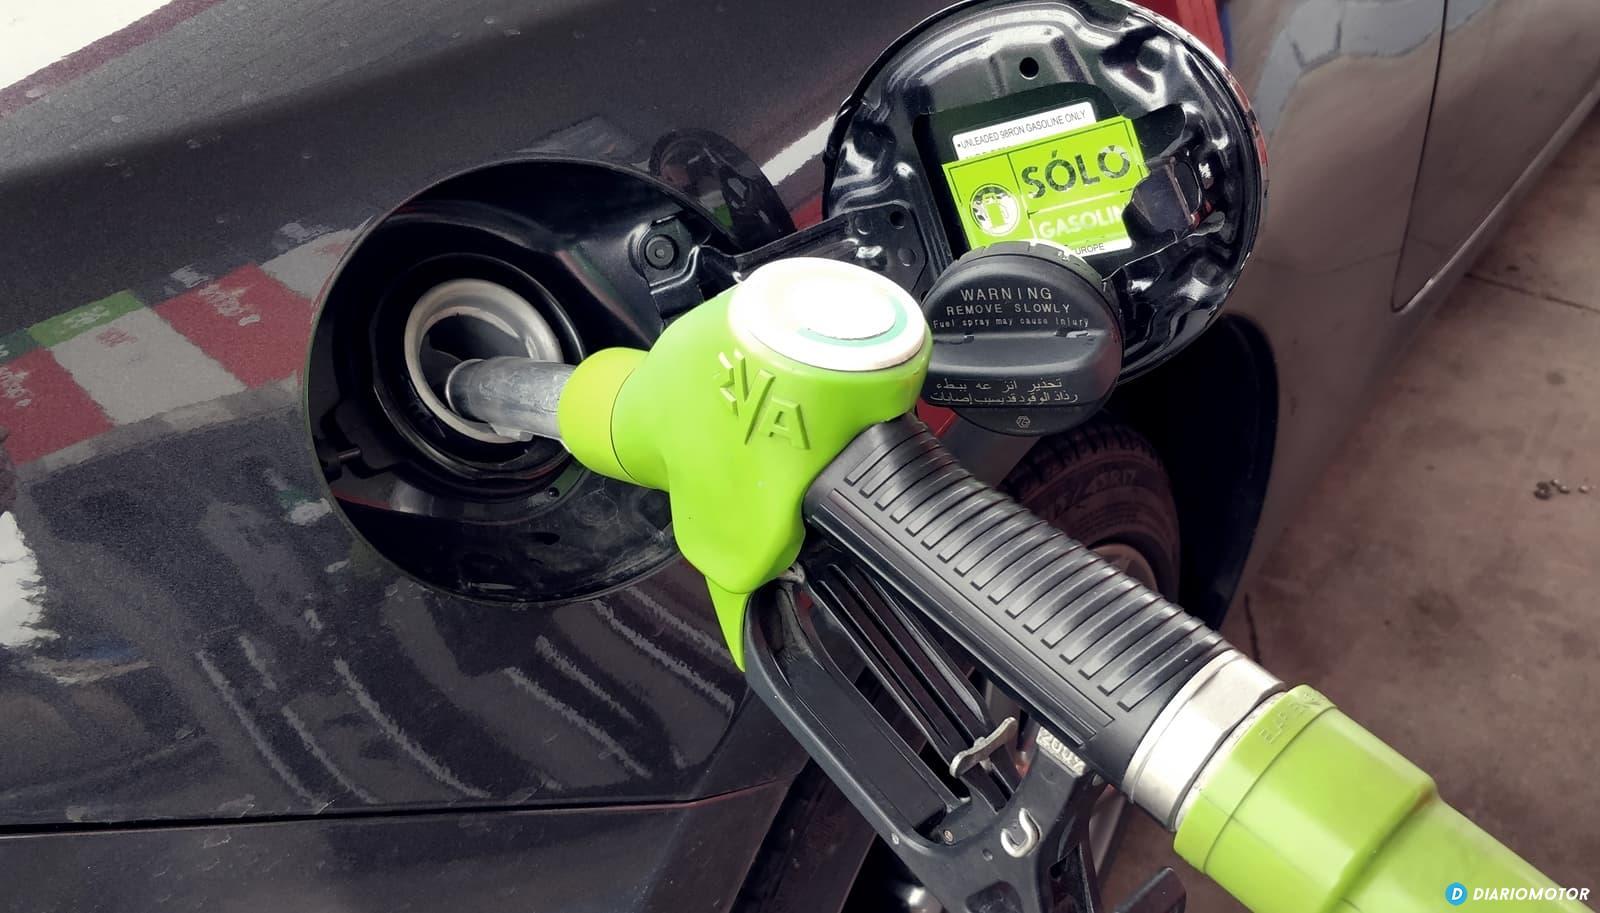 Gasolina Surtidor Repostaje 0119 02